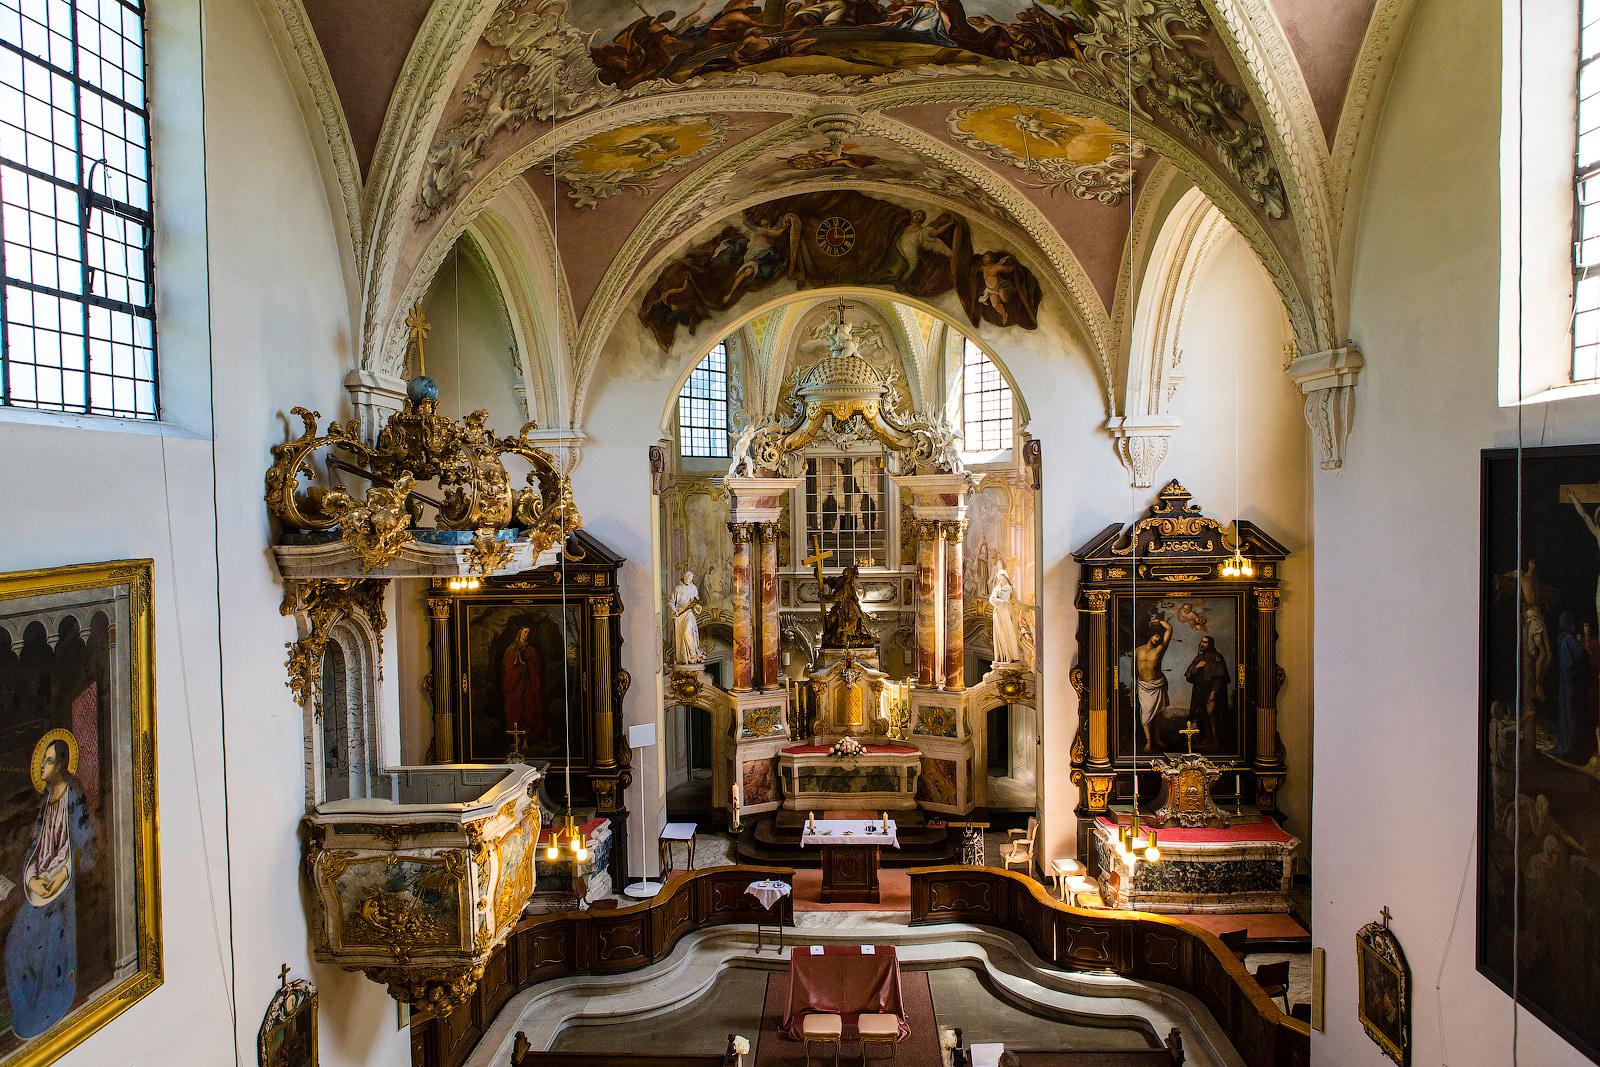 Katholische Kirche in Bonn